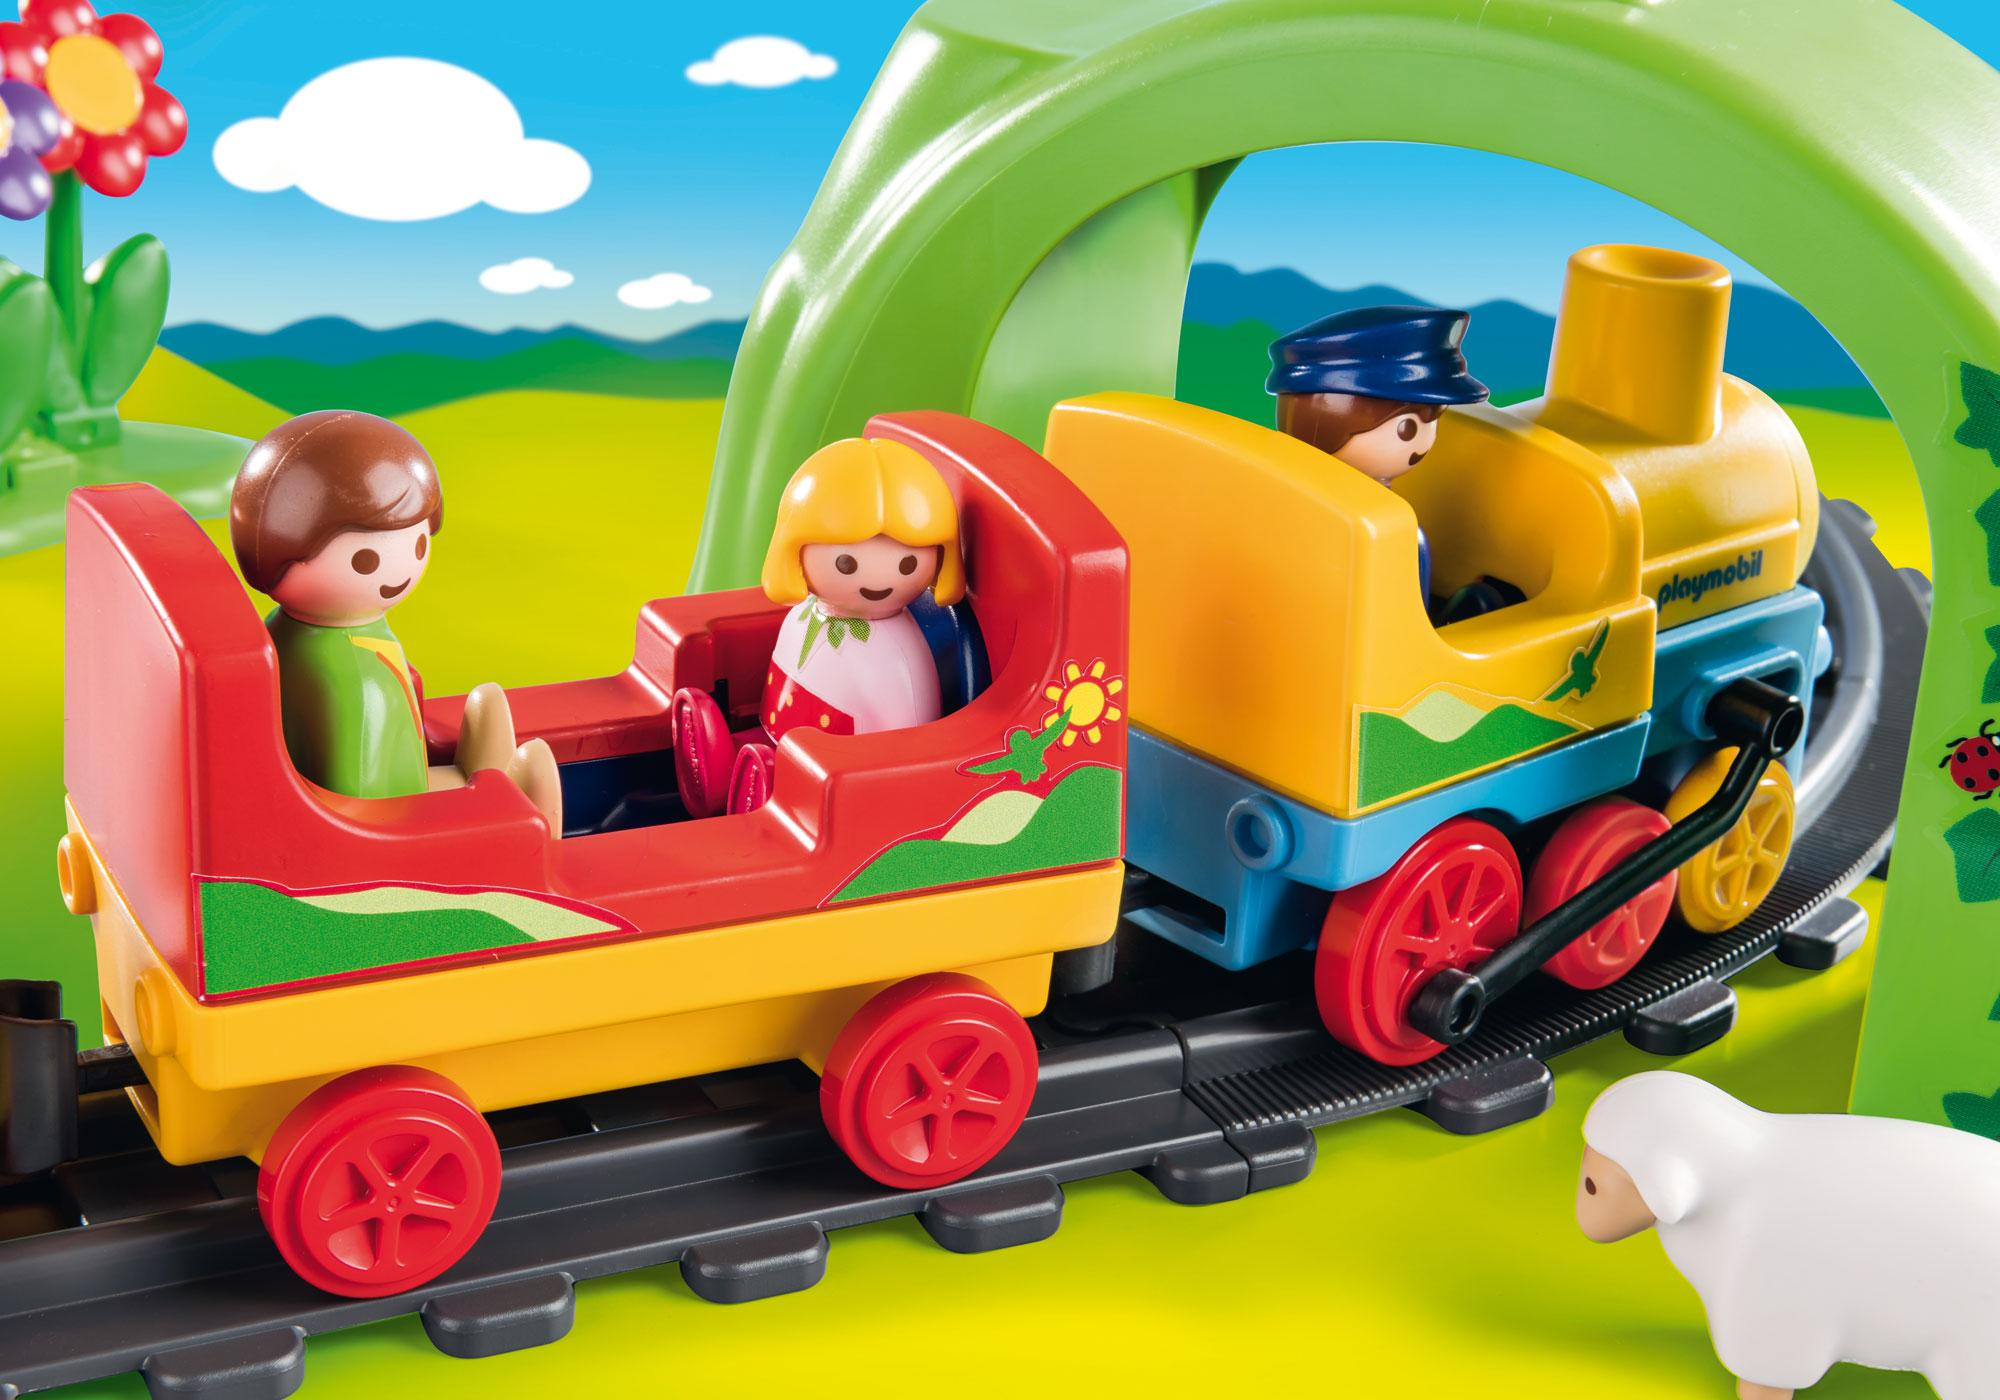 http://media.playmobil.com/i/playmobil/70179_product_extra1/Mijn eerste trein